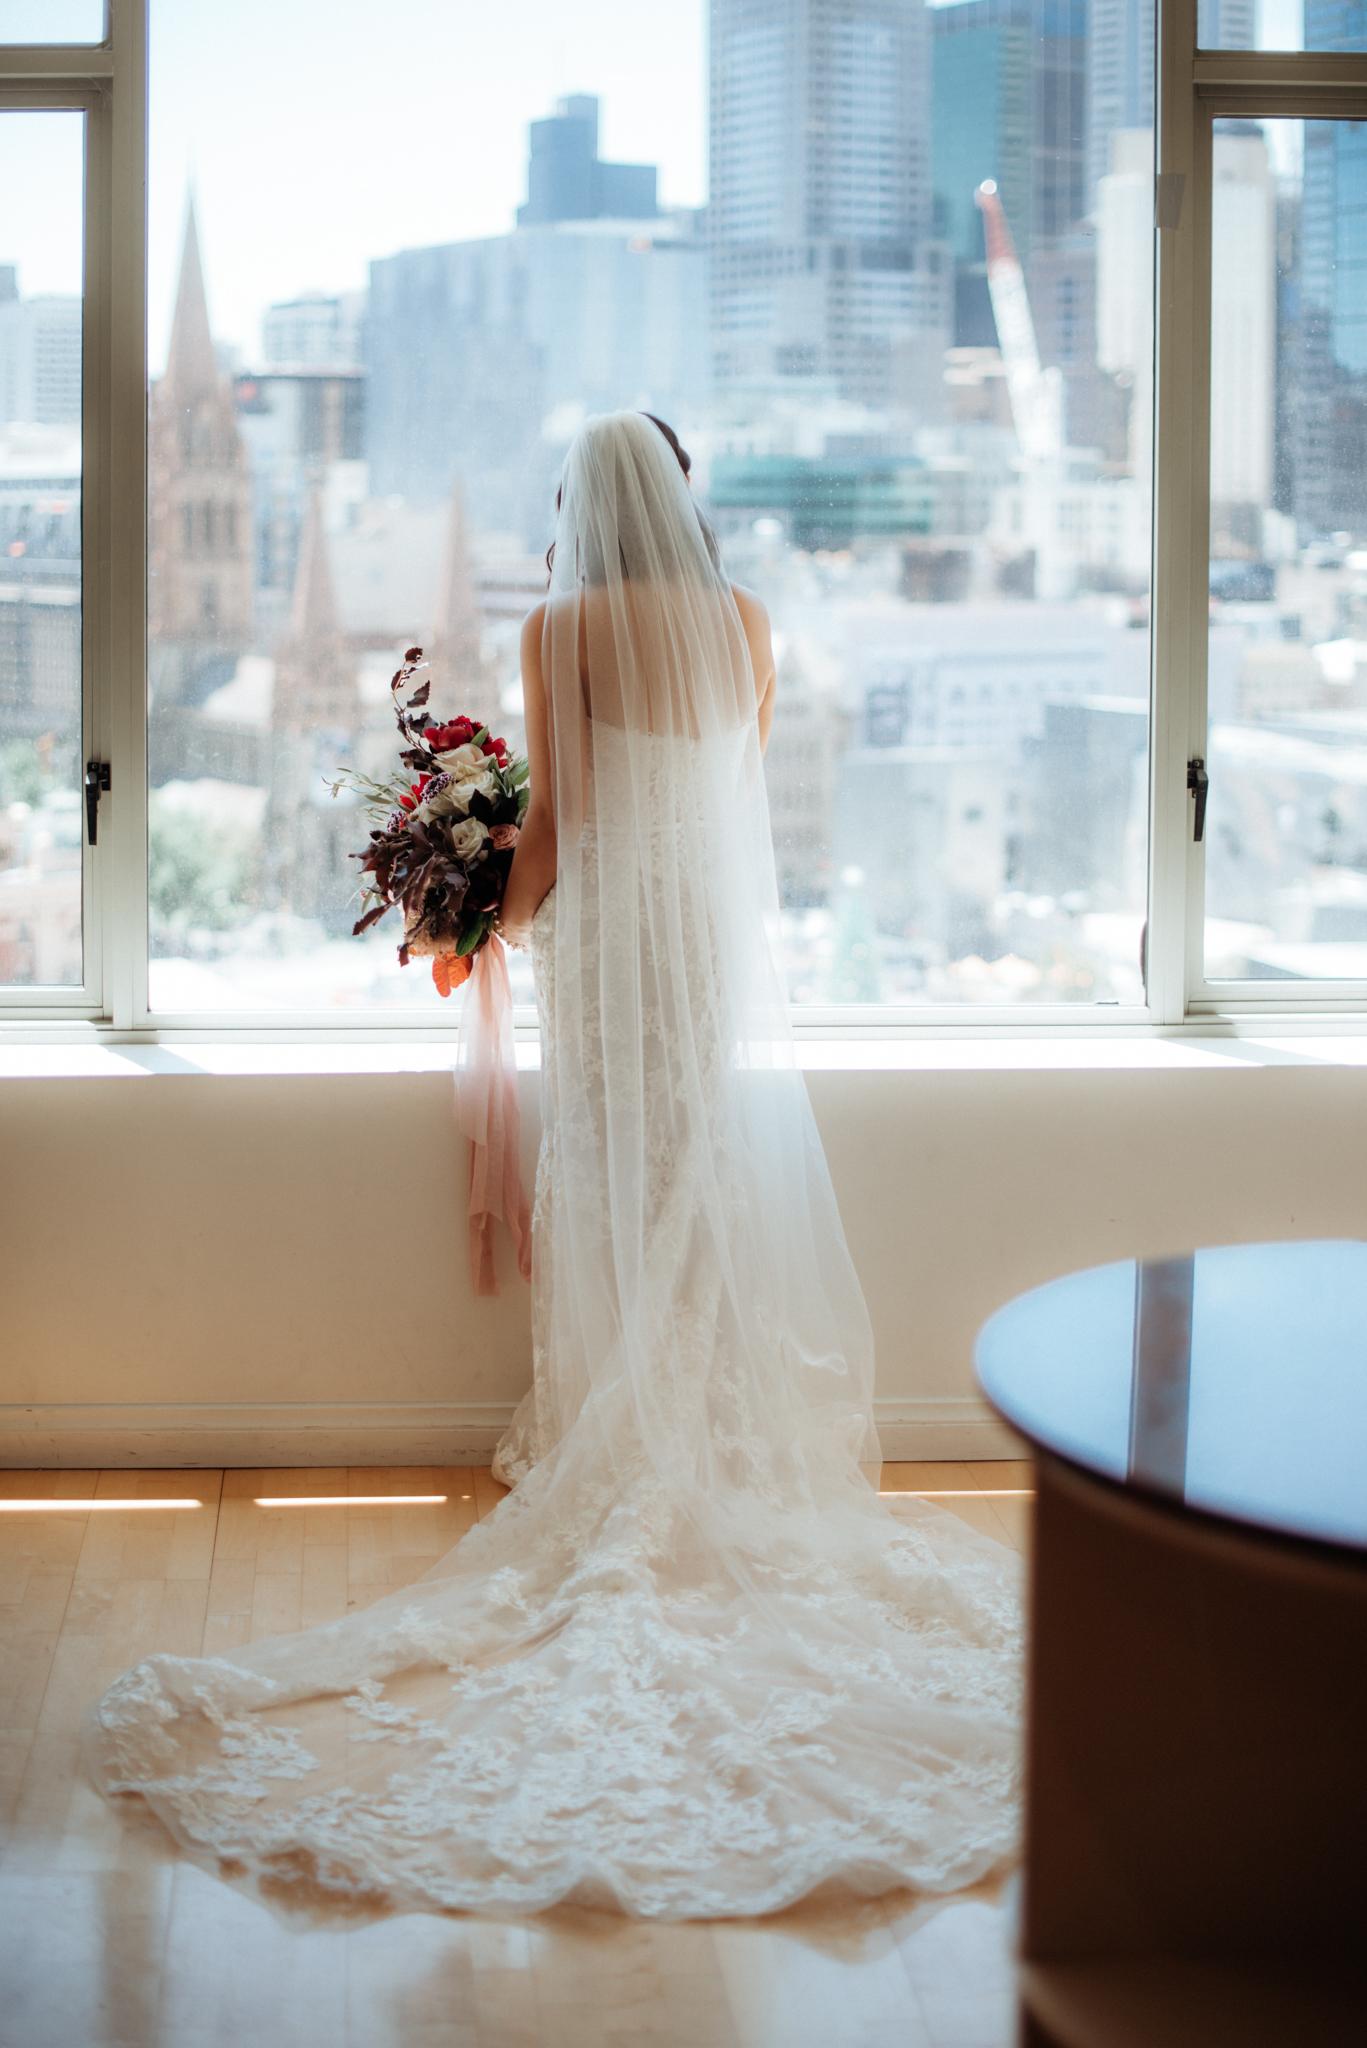 20181206 LOVELENSCAPES PHOTOGRAPHY X REZA & DEREK 8.jpg